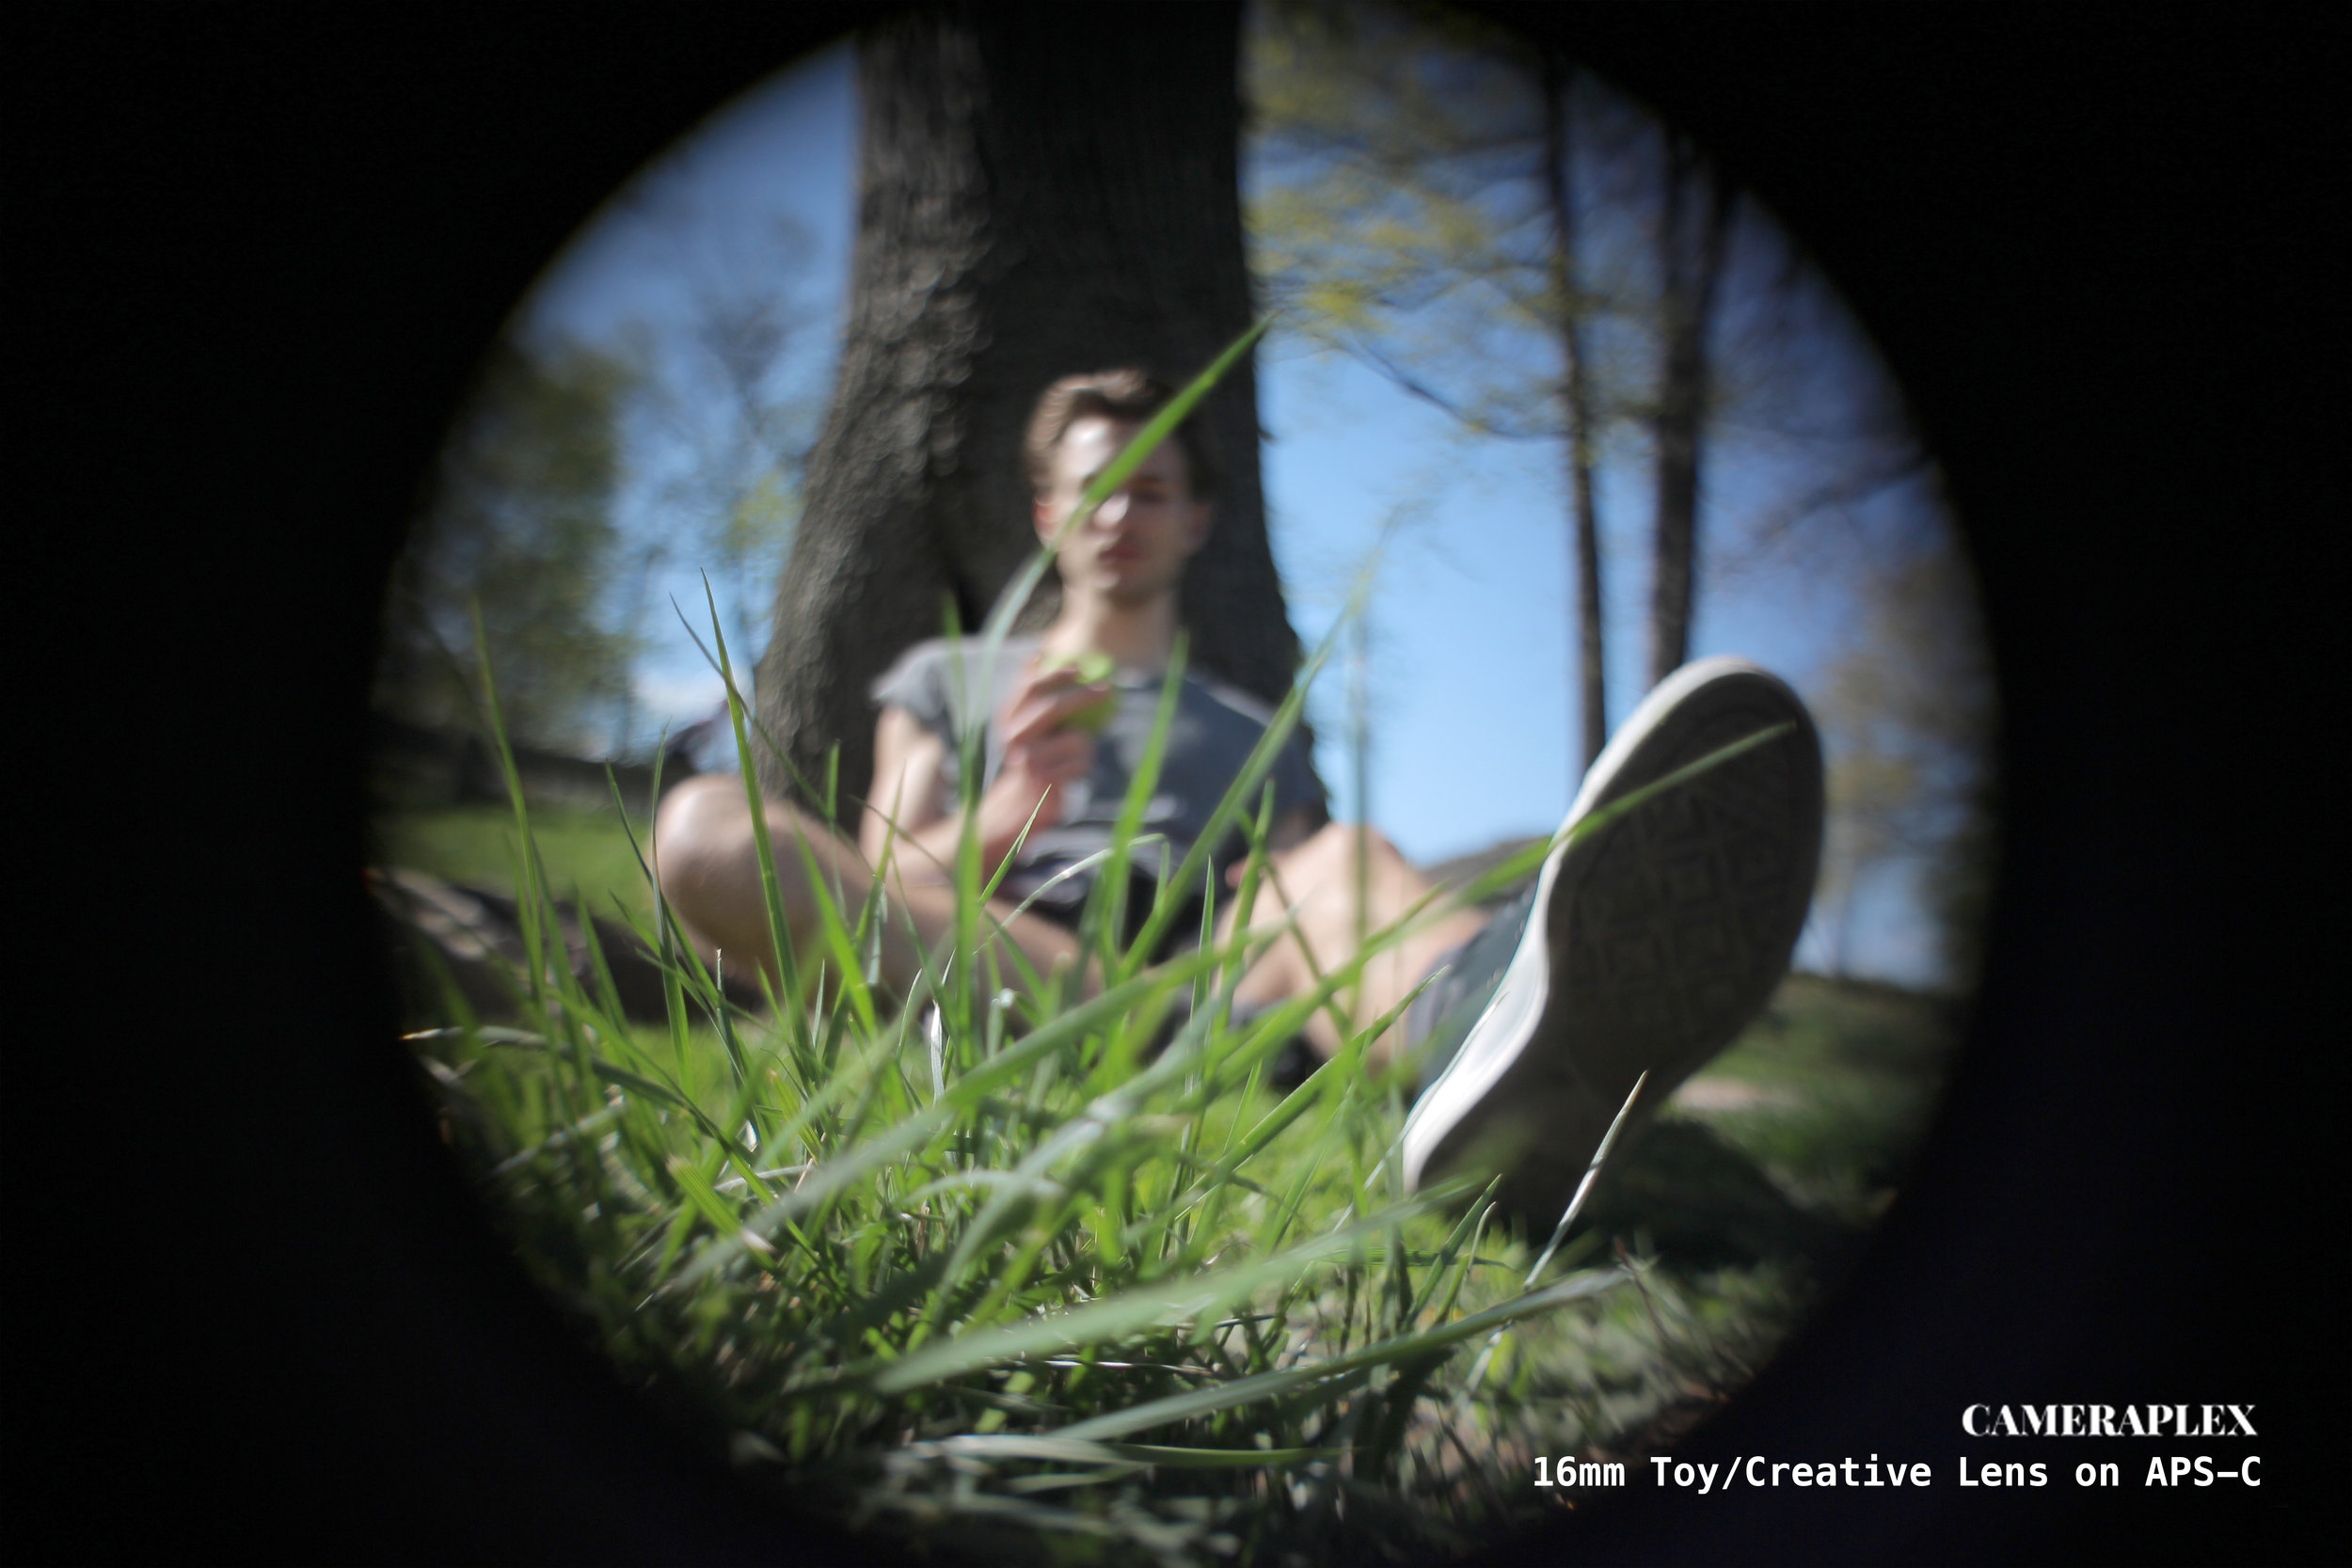 types of camera lenses, 16mm toy creative lens example Cameraplex